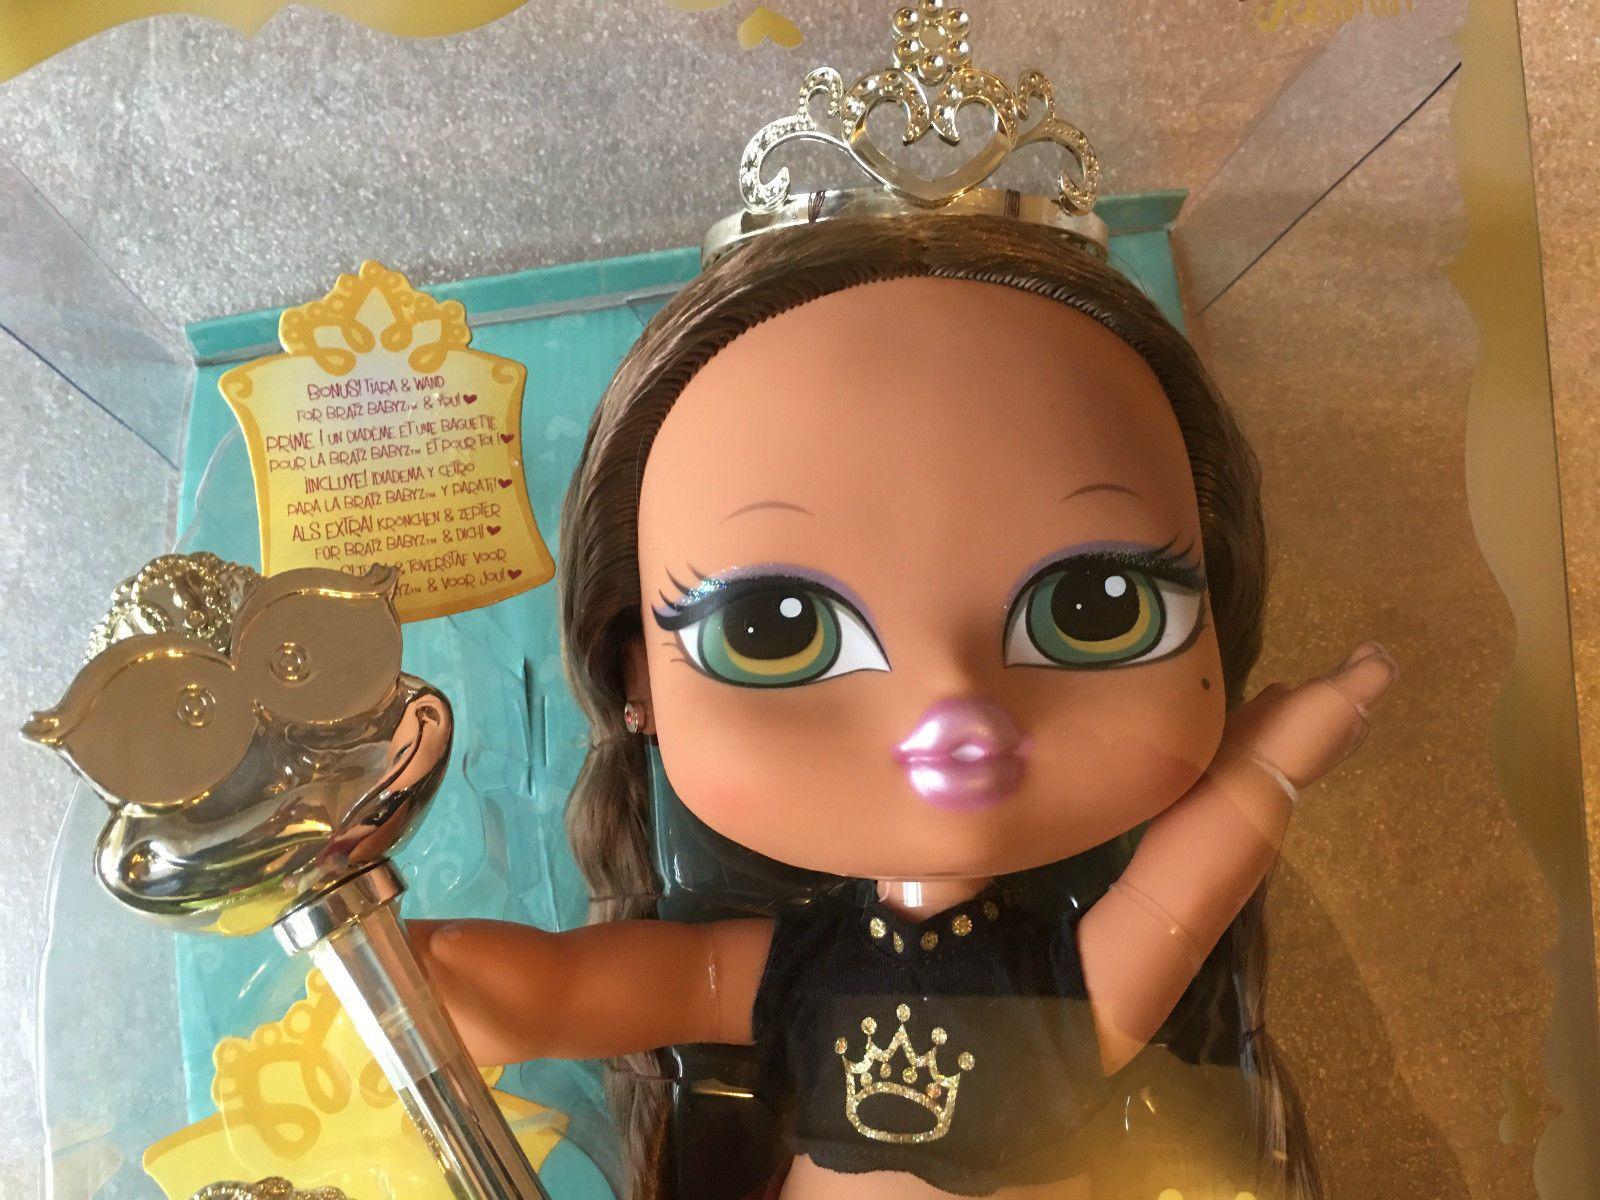 BNIB Bratz Big Babyz Princess Yasmin Doll Approx 12 Inches Tall